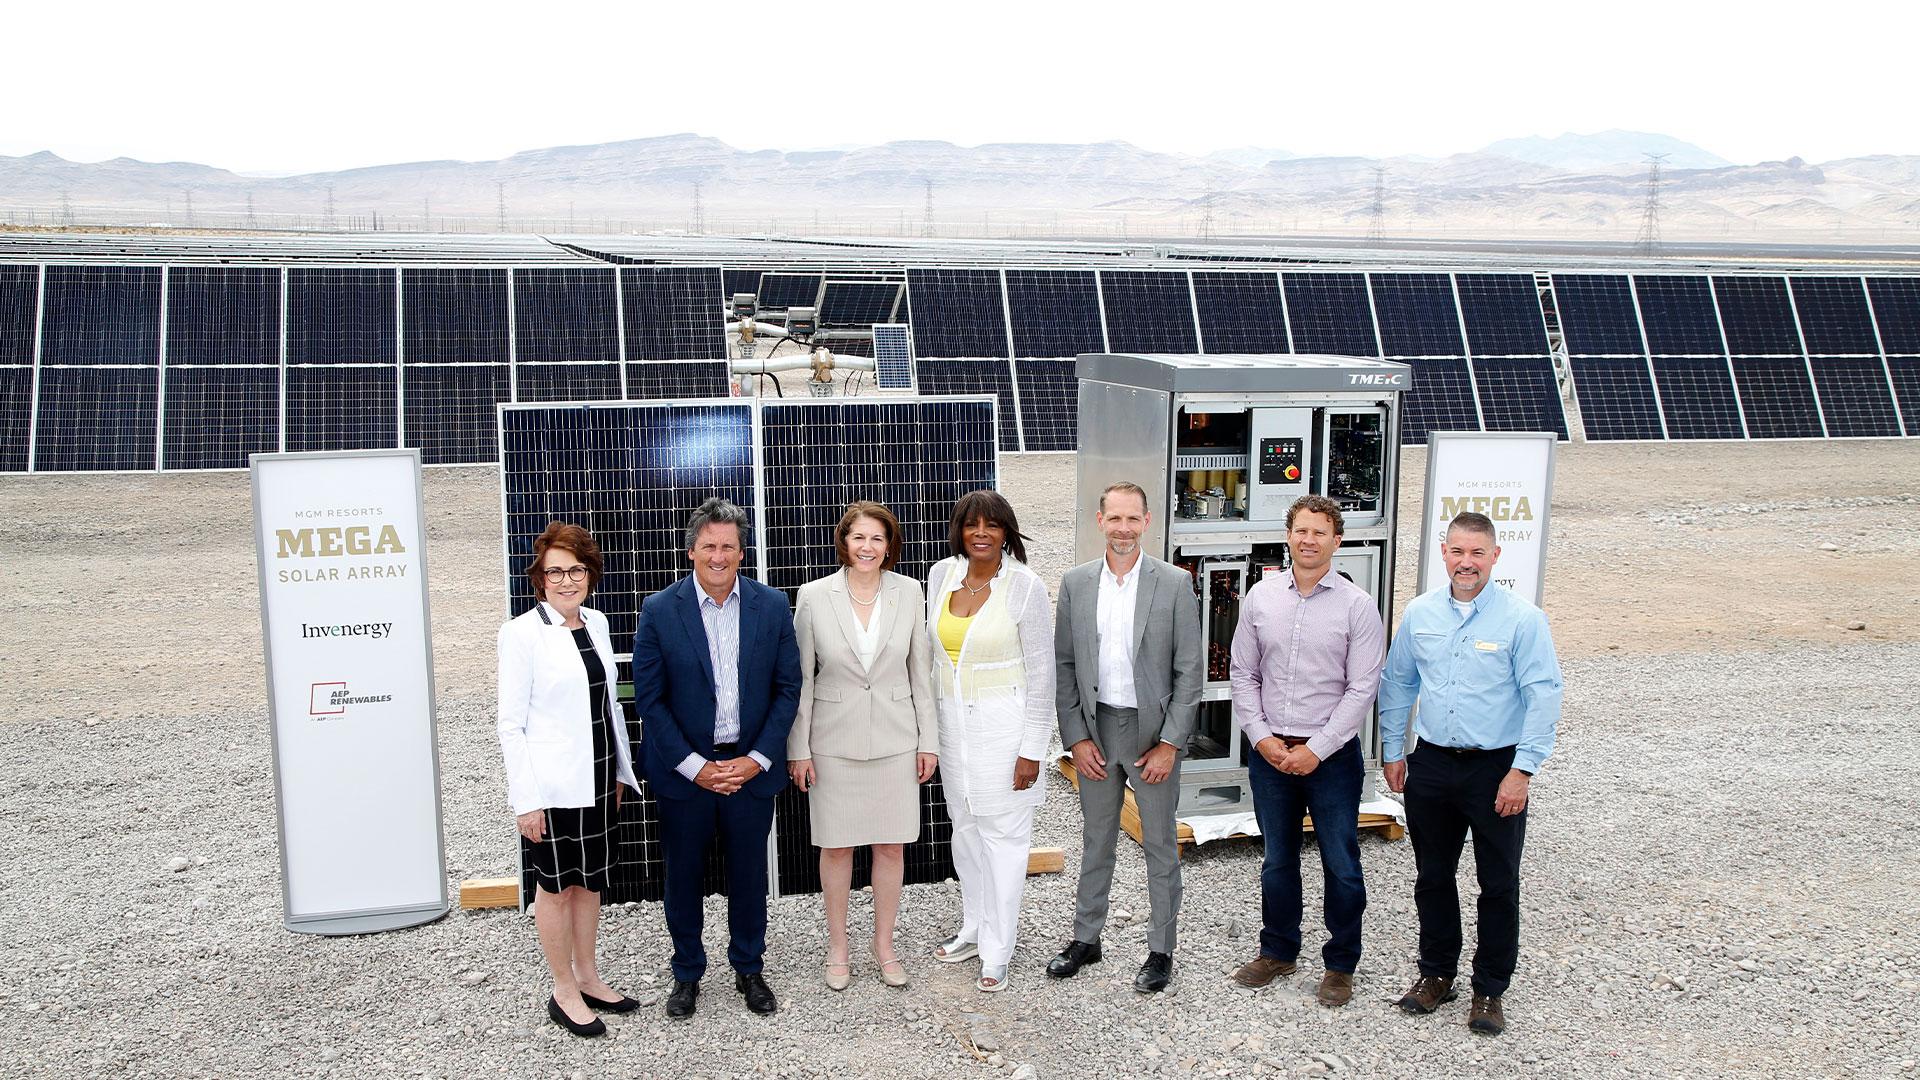 U.S. Sen. Jacky Rosen, MGM President & CEO Bill Hornbuckle, U.S. Sen. Catherine Cortez Masto, Rose McKinney-James, Greg Hall, Bo Alley and Jon K. Raby at the MGM Resorts solar array launch.